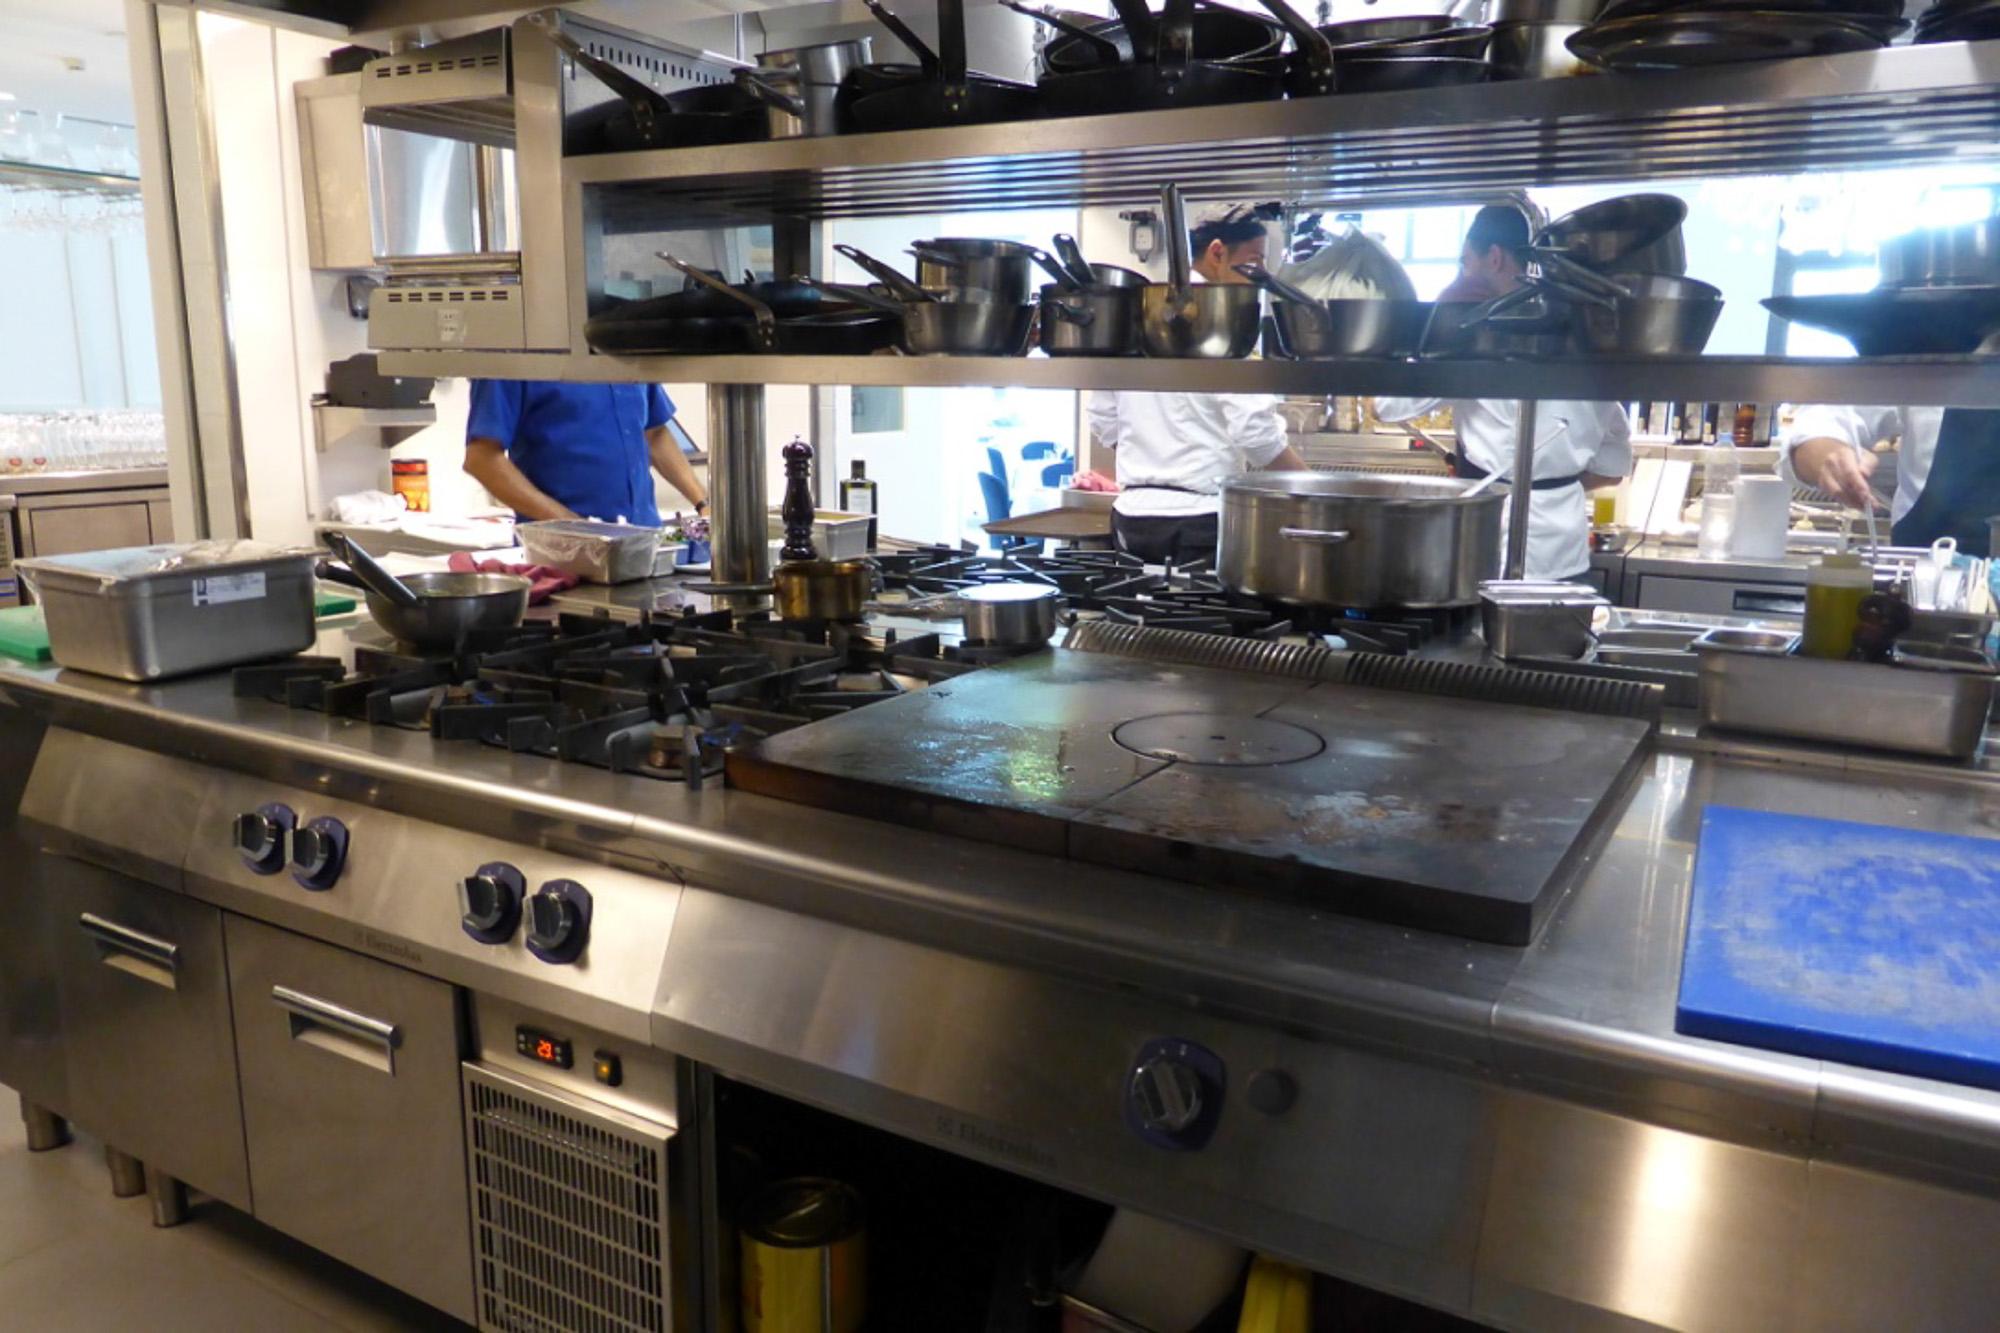 Italia_kitchen_-Bice_d-4